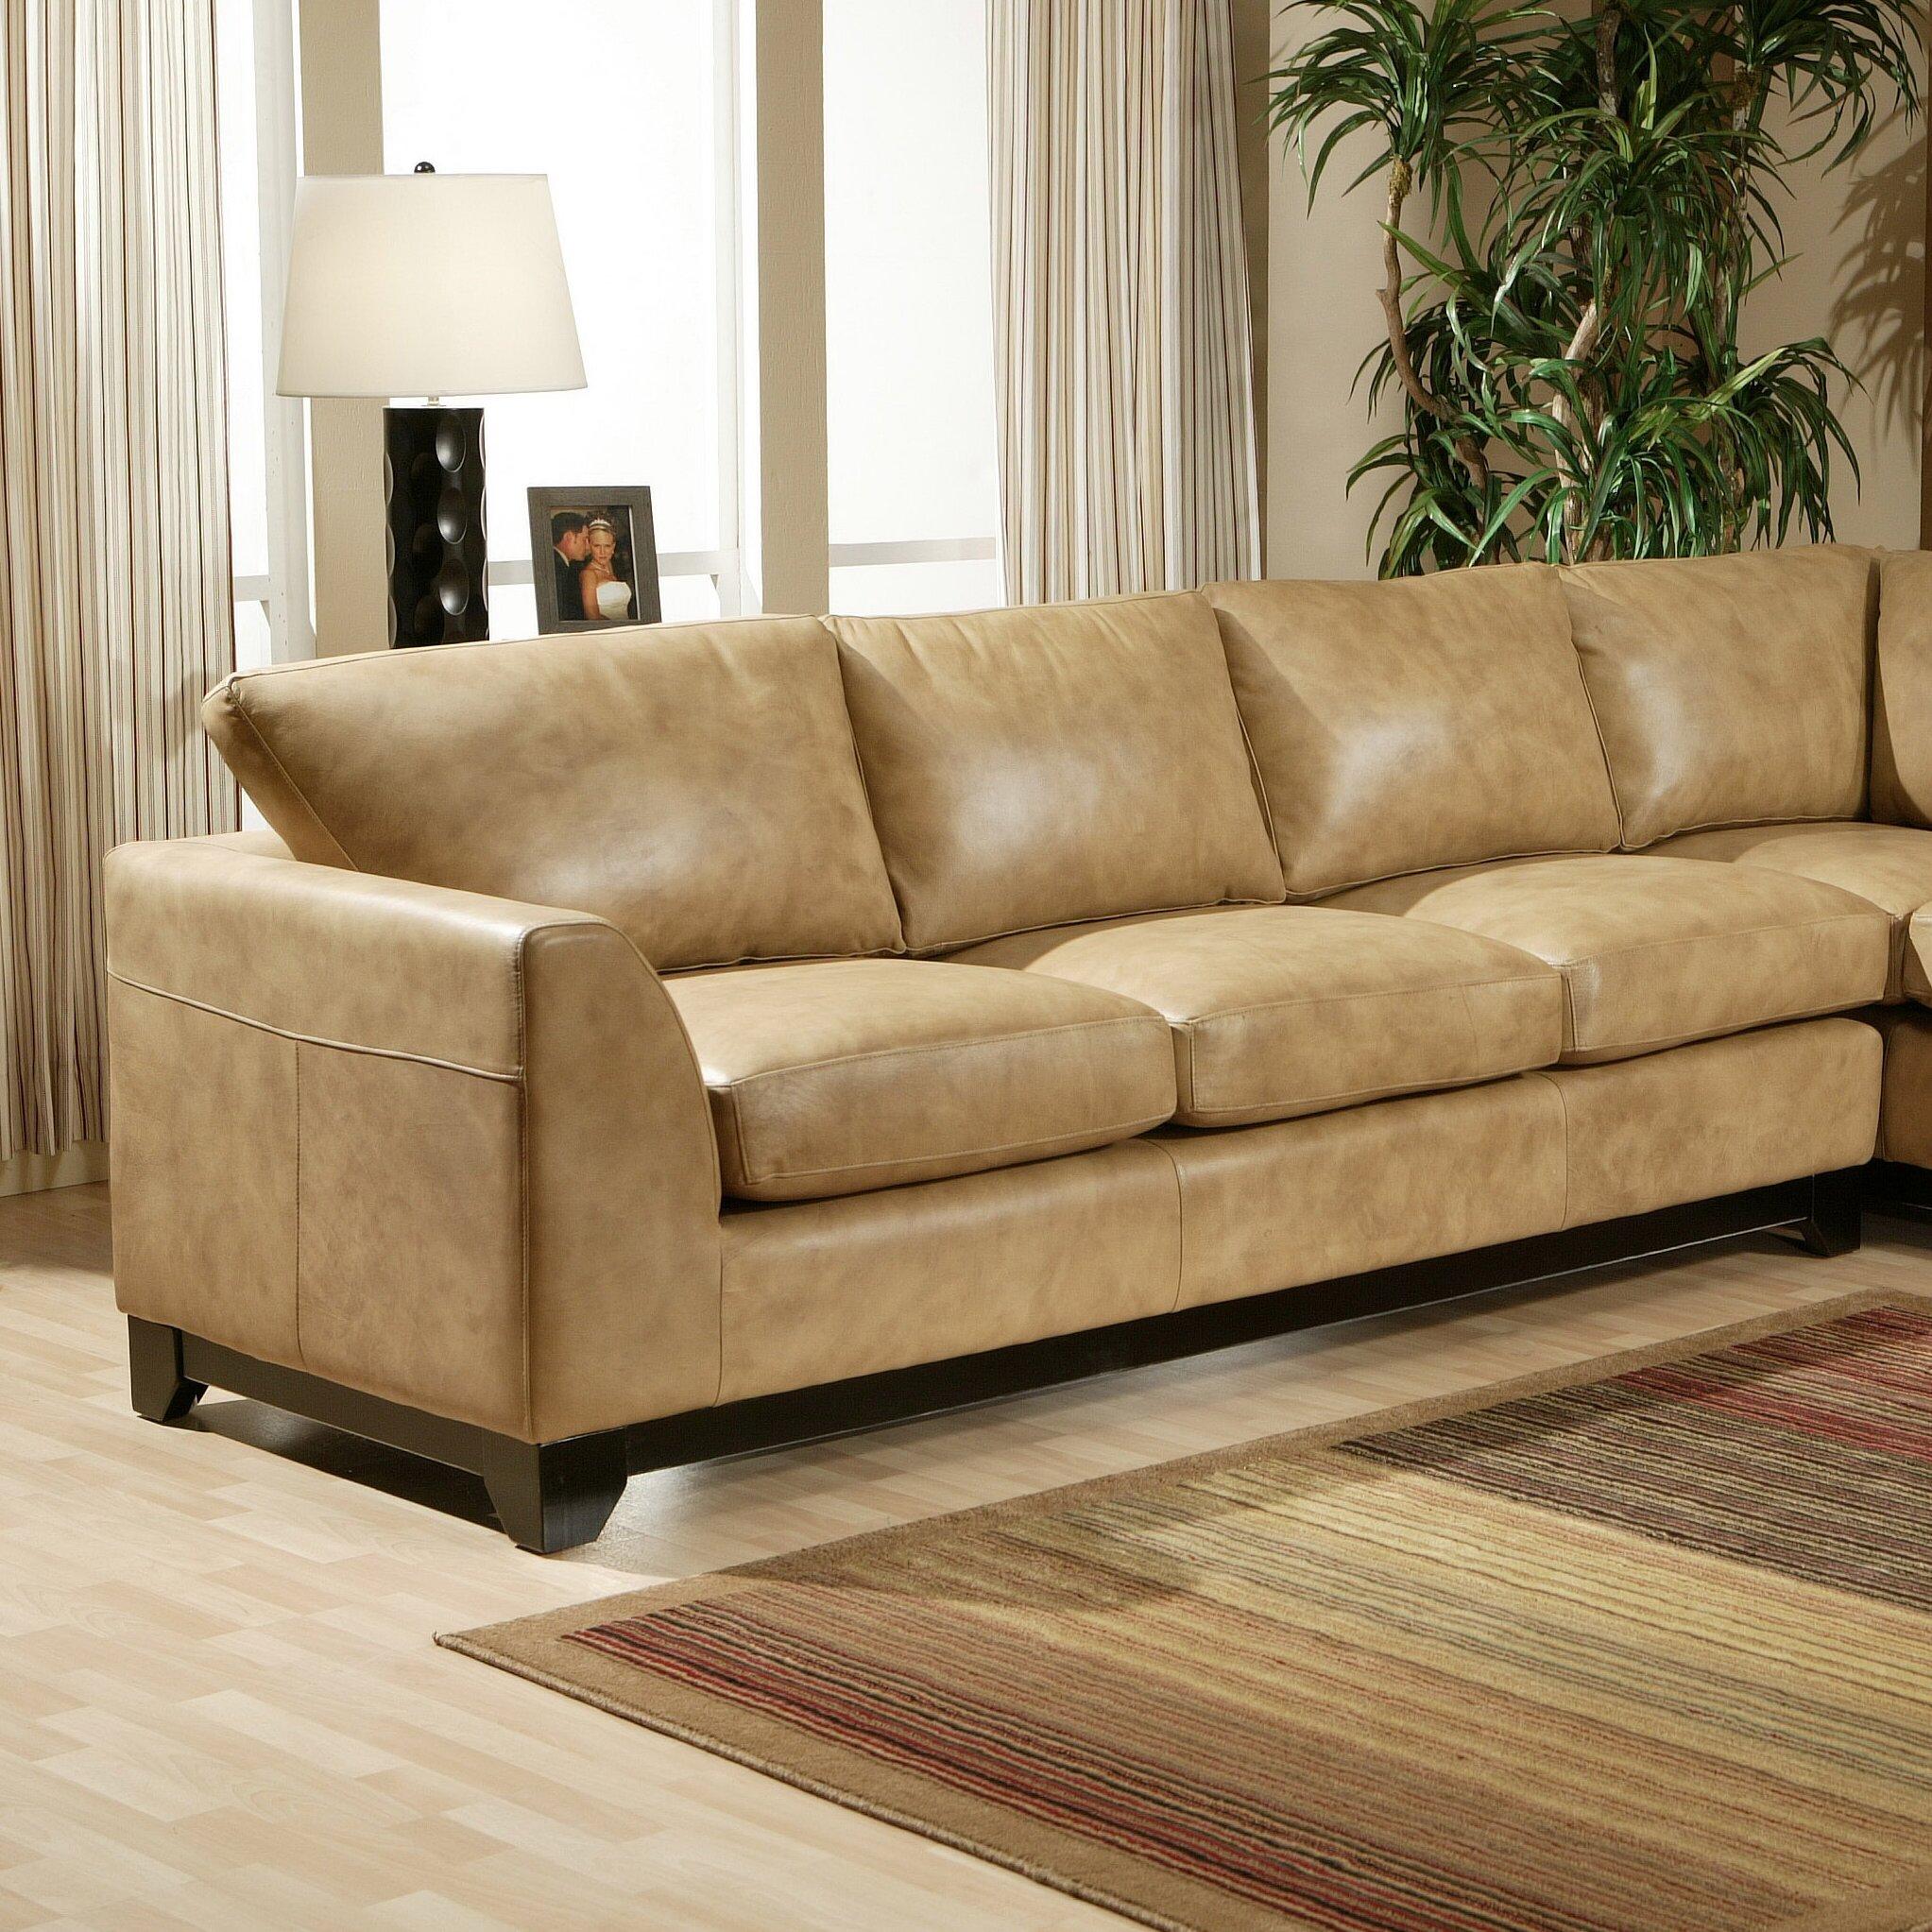 Omnia Leather City Sleek Leather Sofa Wayfair